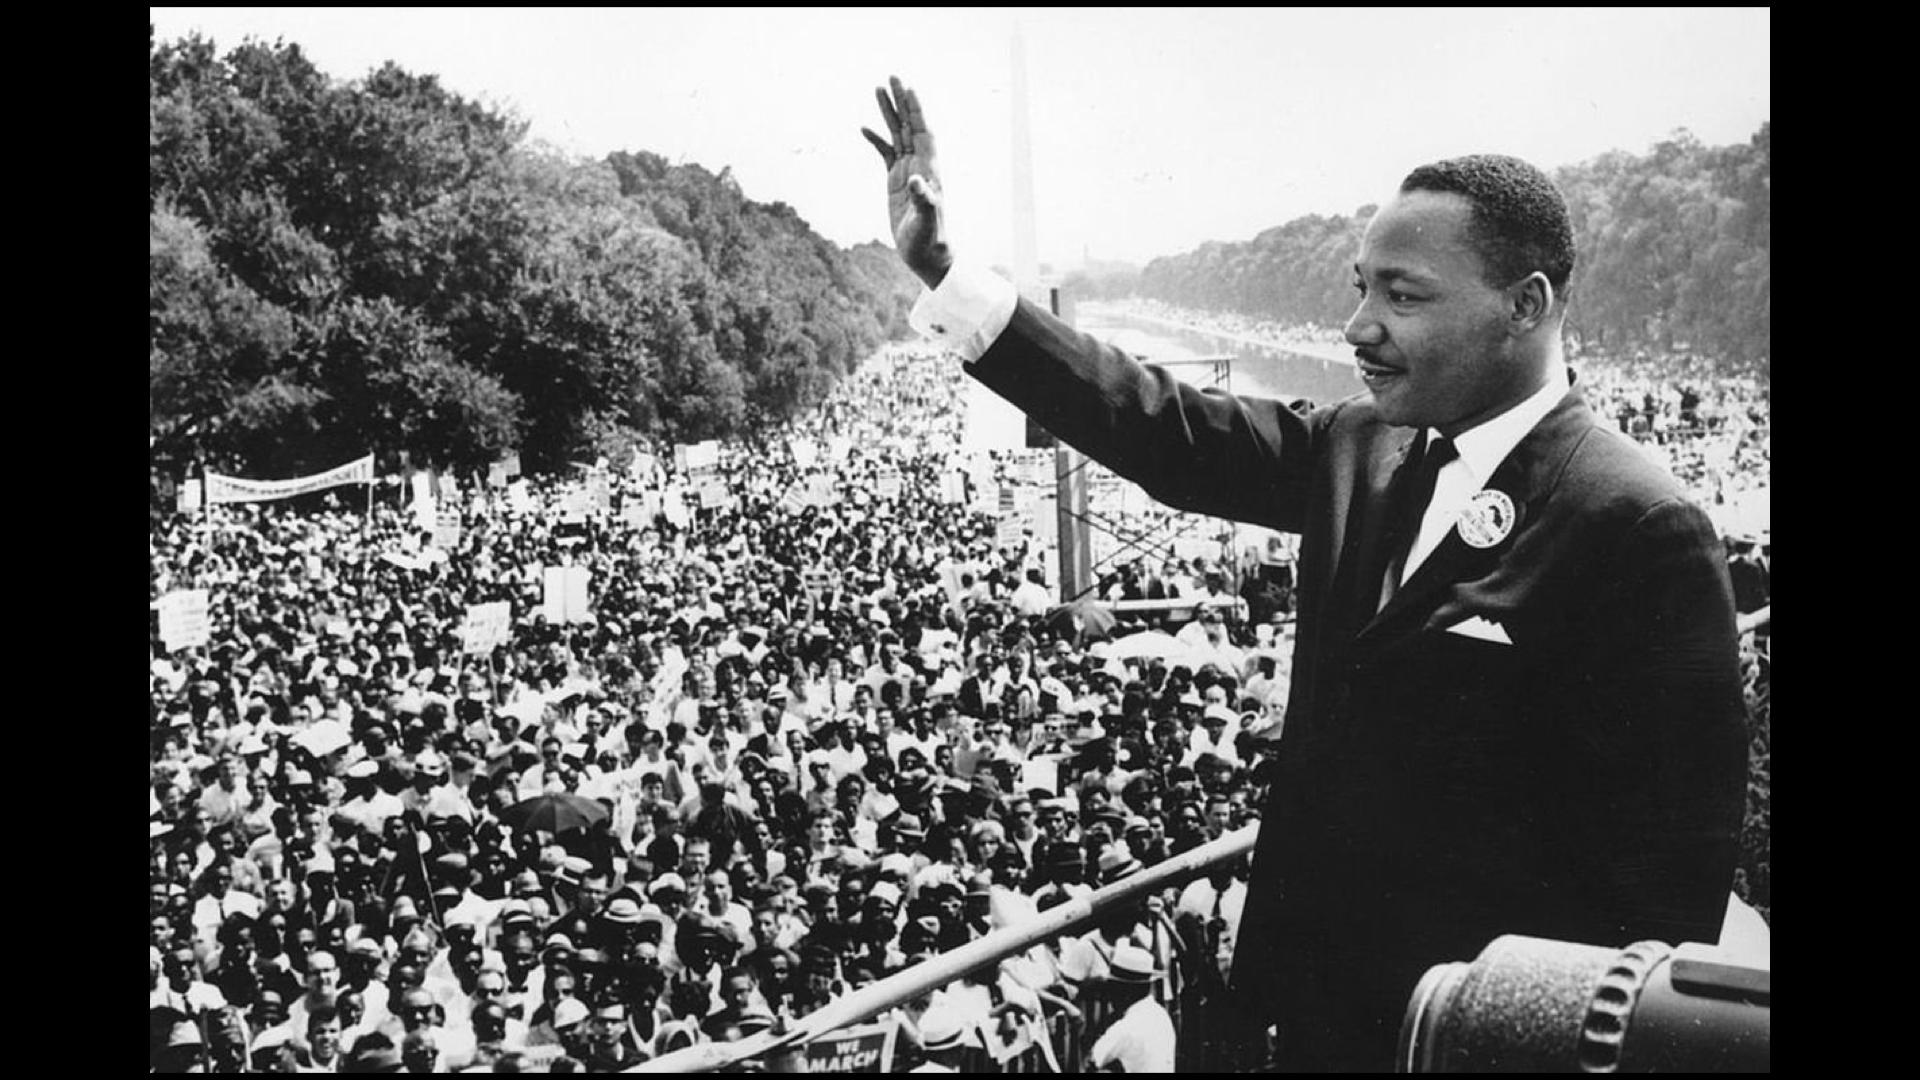 I have a dream.009.jpeg